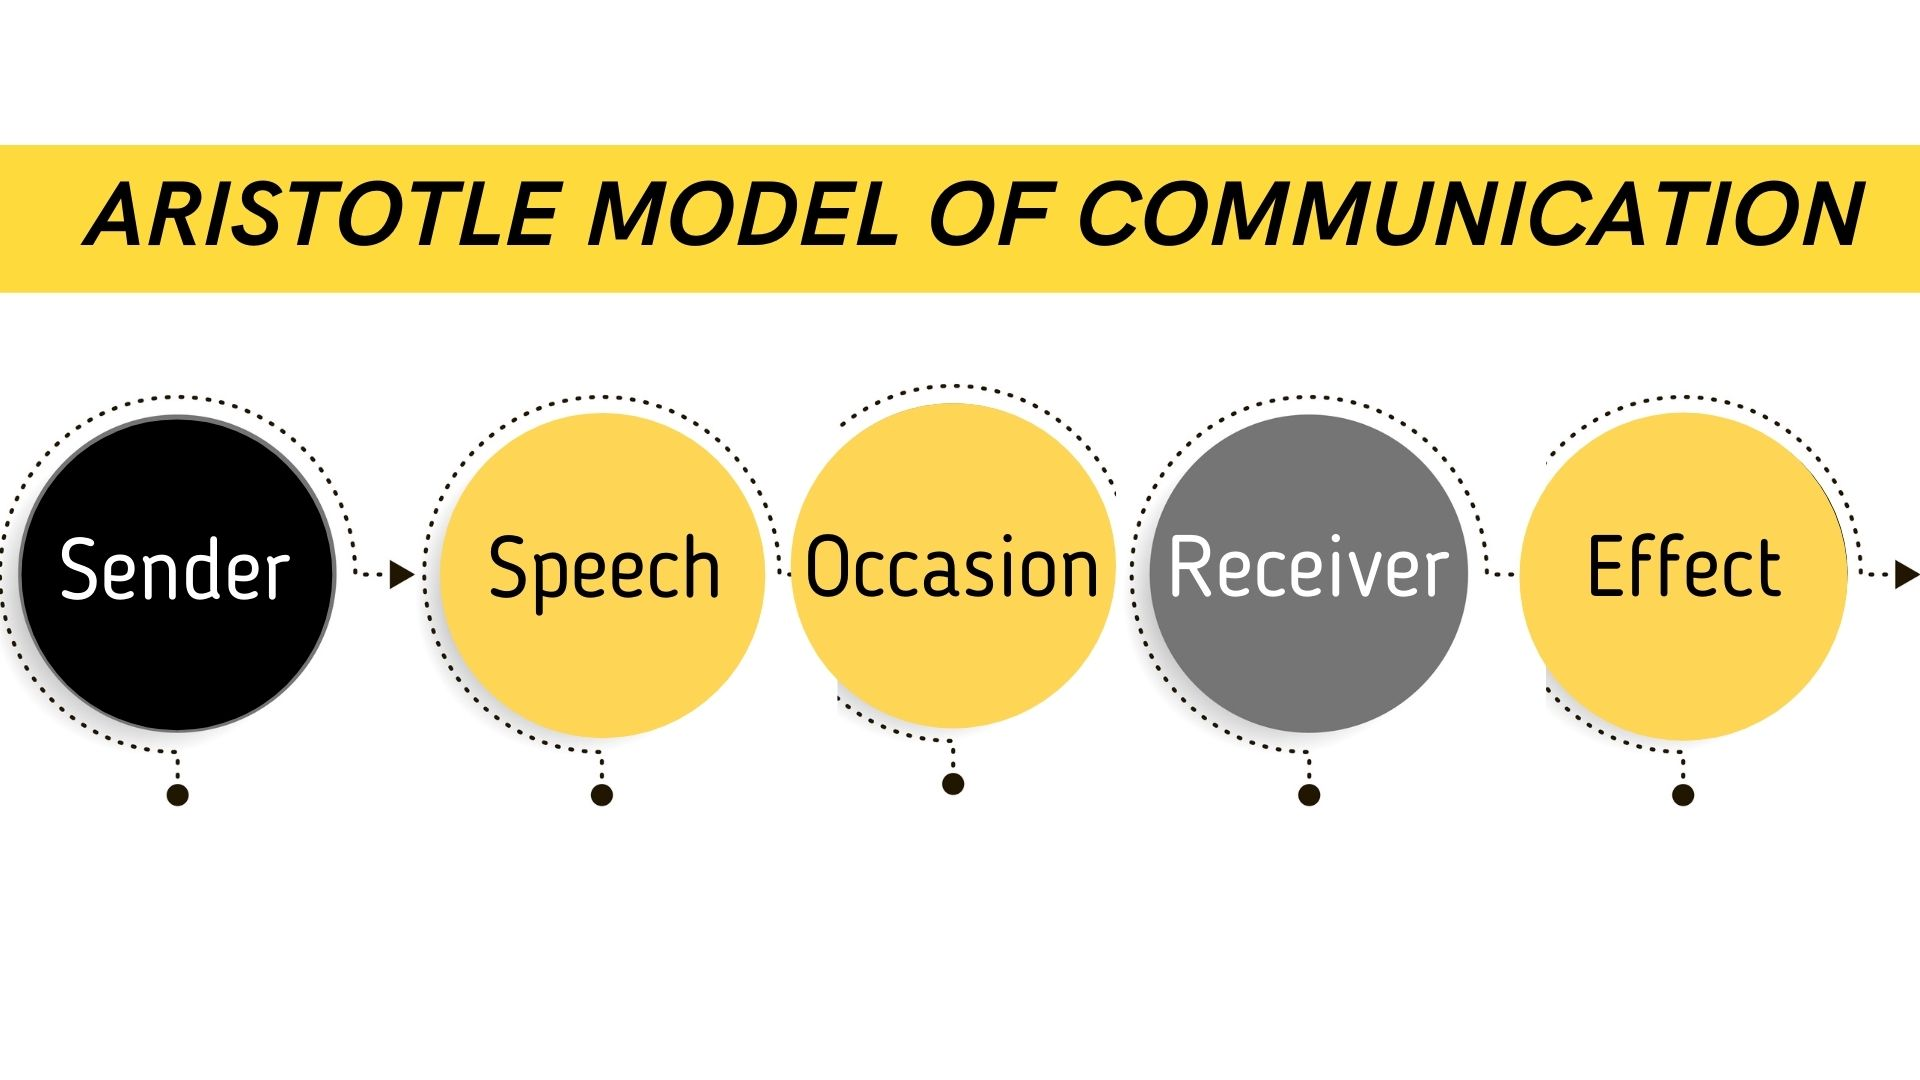 Aristotle Model of Communication